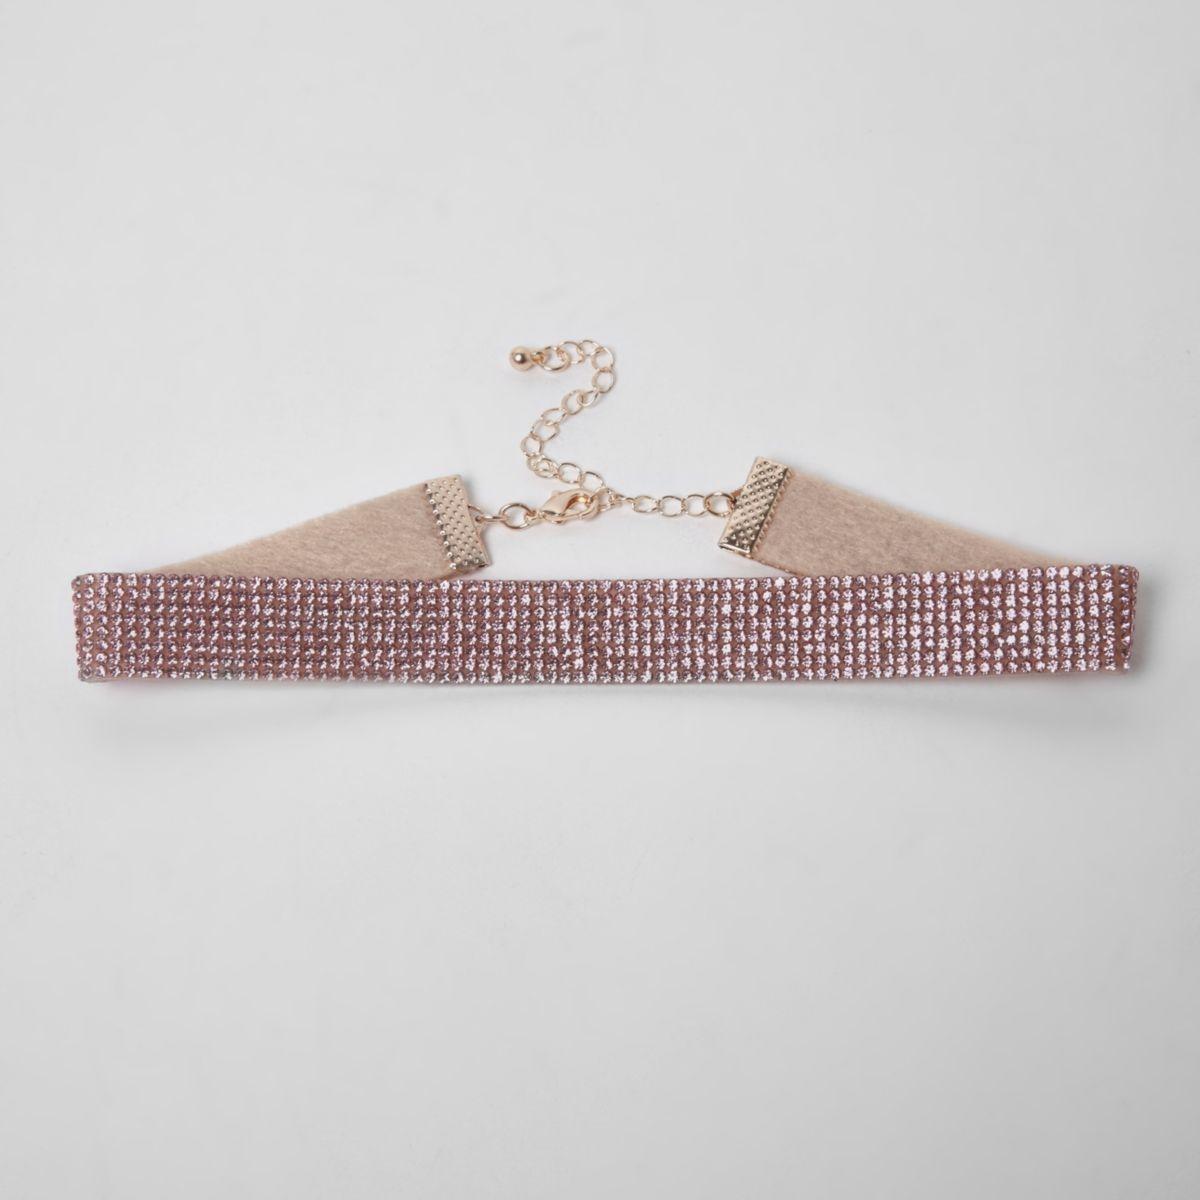 Light pink heatseal diamante choker